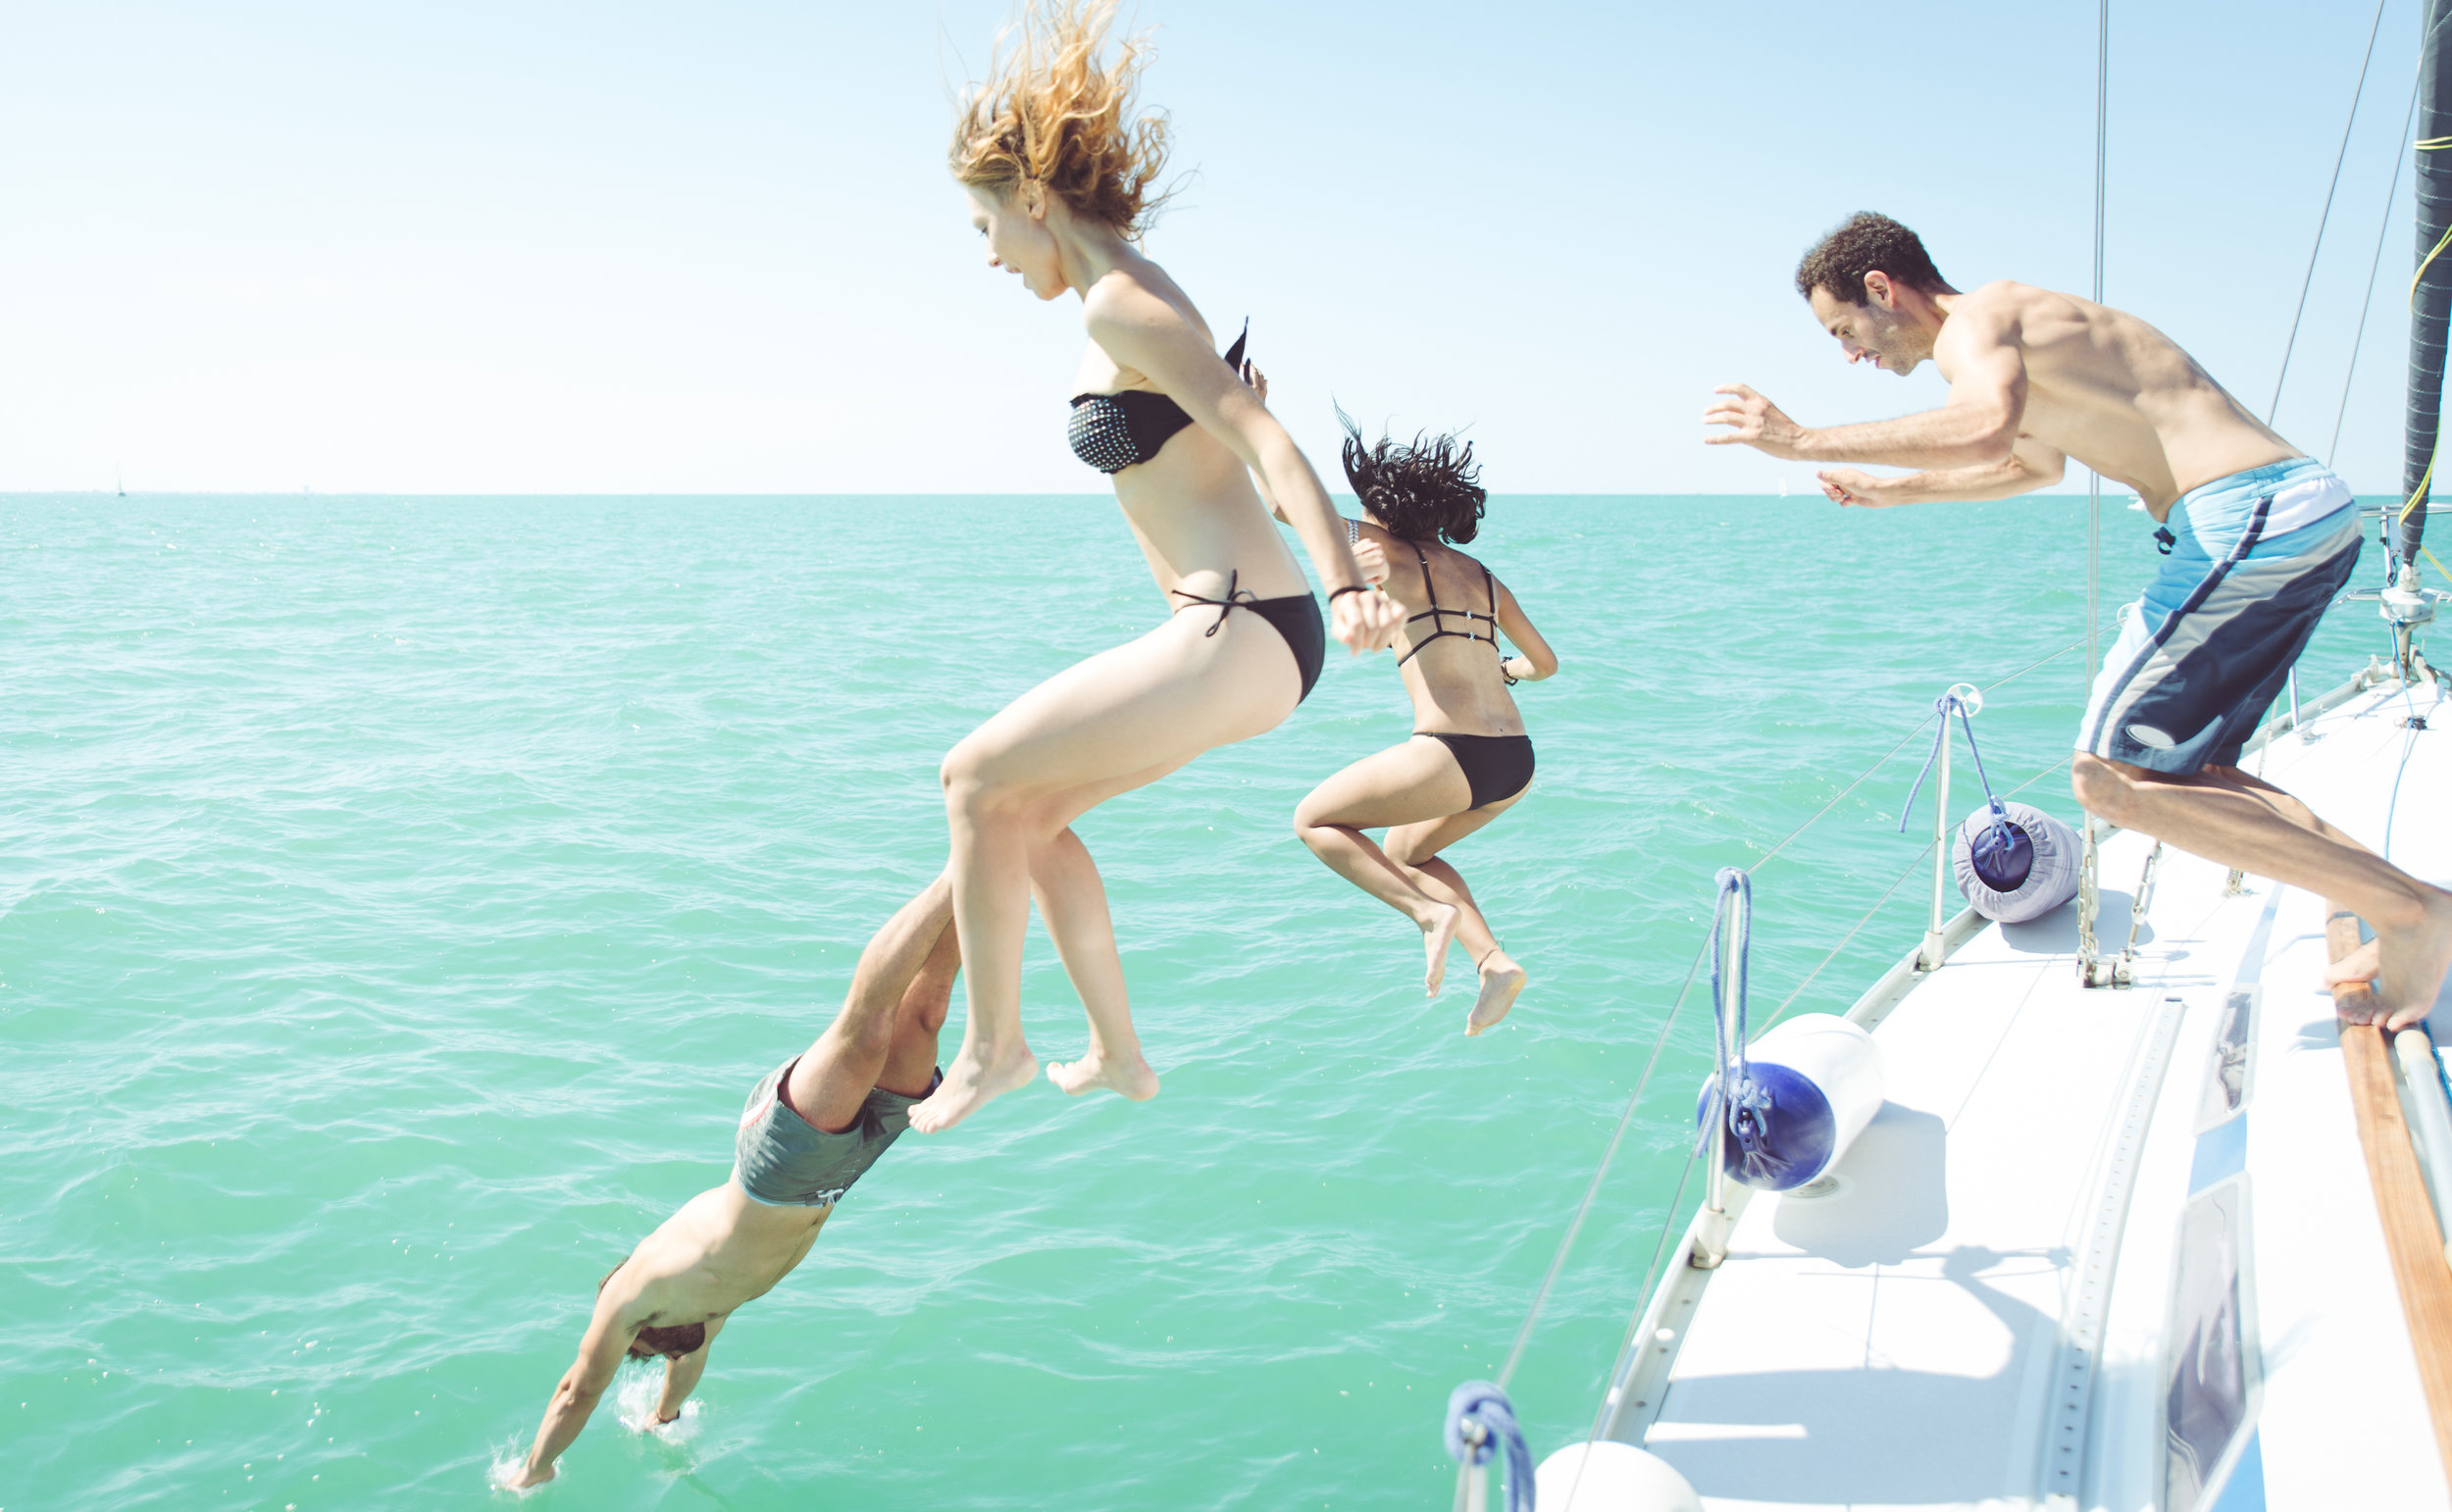 jumping on the sea.jpg